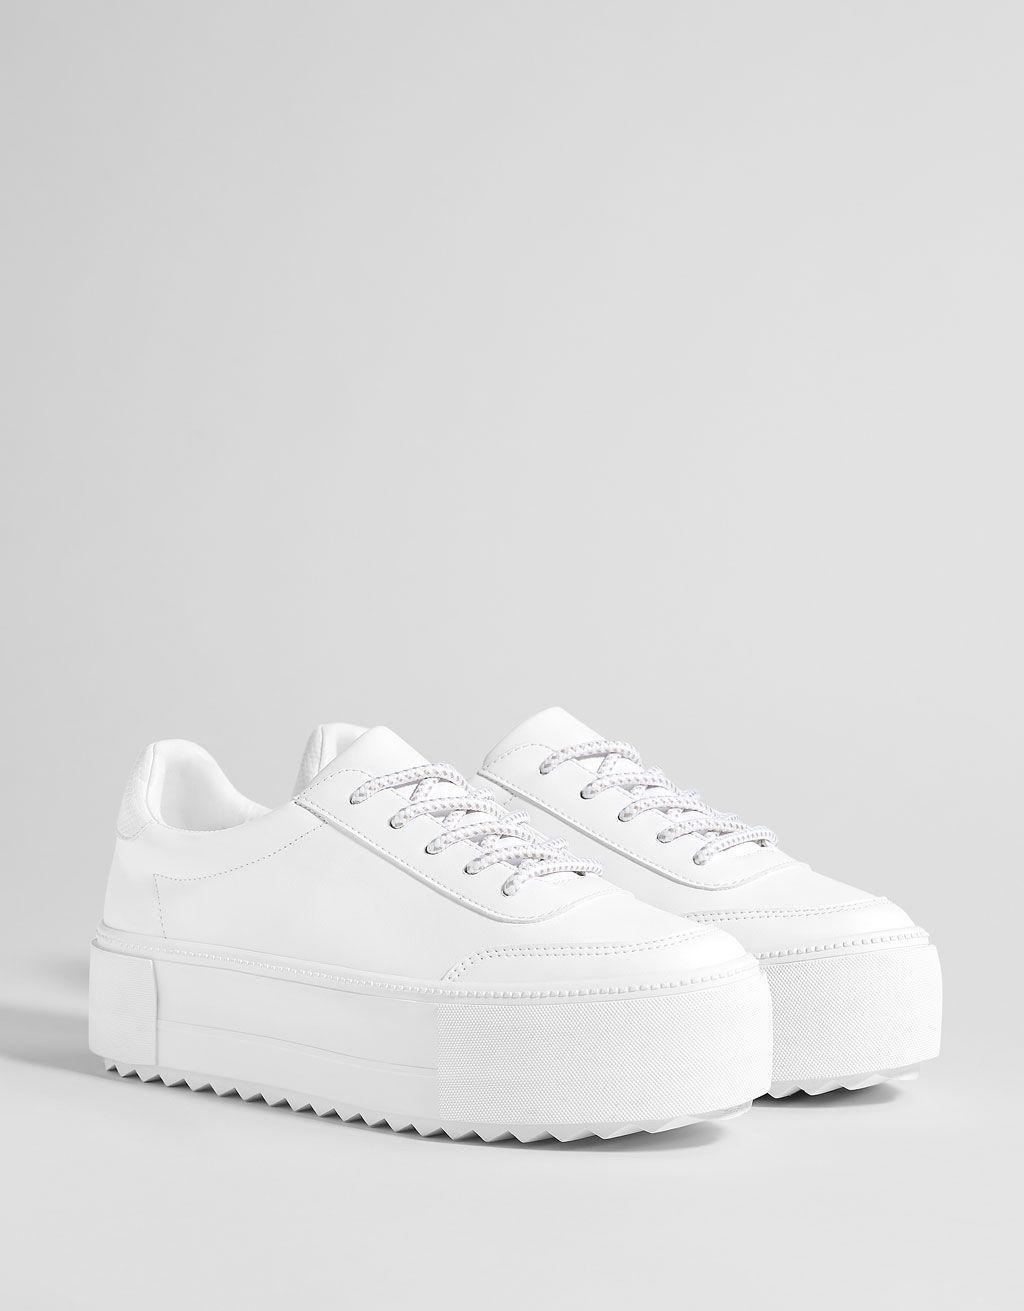 new style 5e4d7 62d3e Zapatilla blanca plataforma. Descubre ésta y muchas otras prendas en  Bershka con nuevos productos cada semana